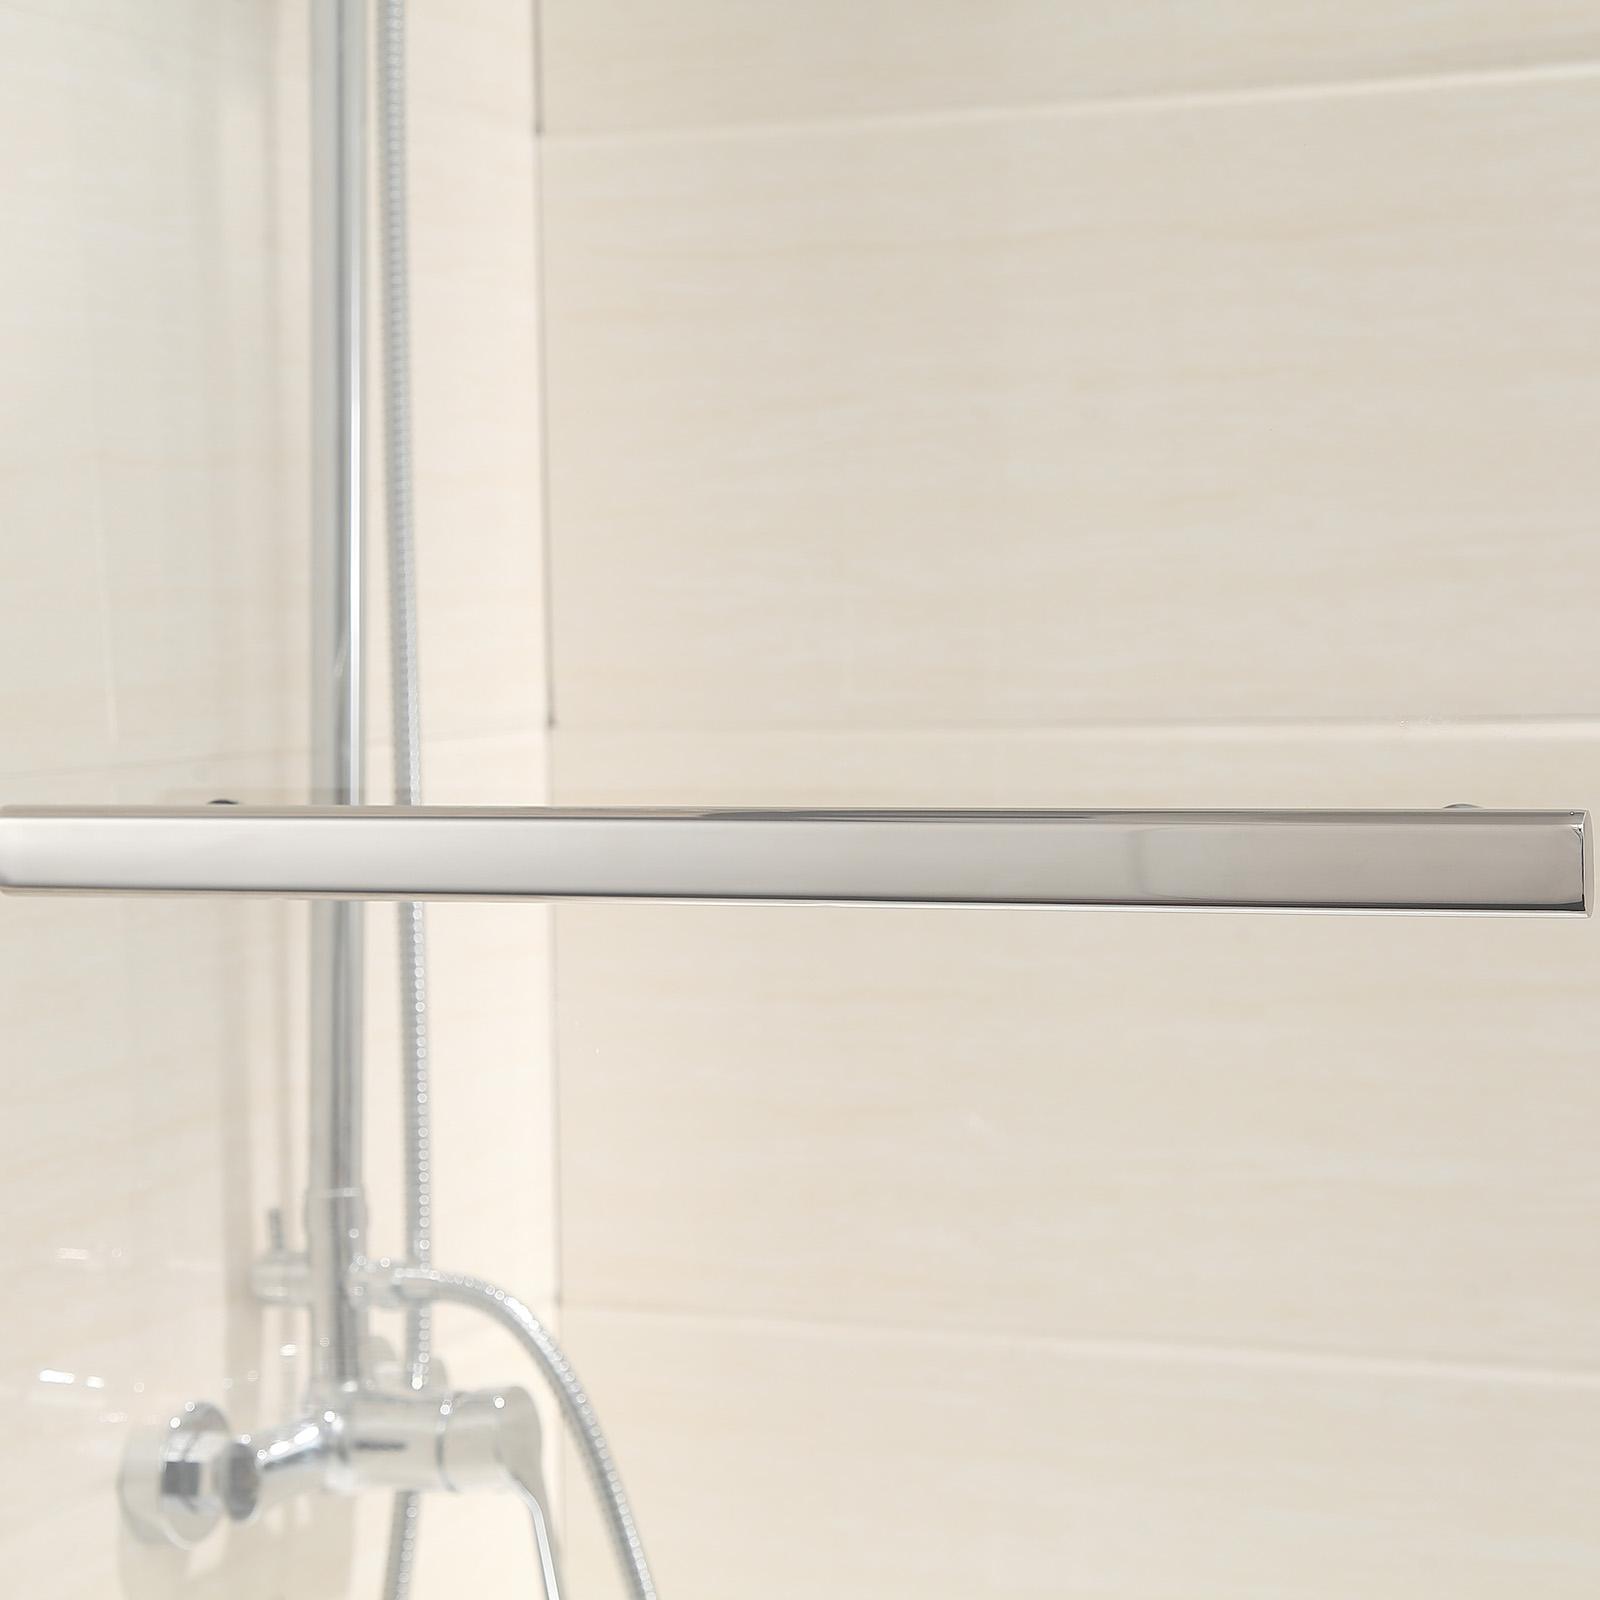 800x1400mm 180 Pivot Shower Screen Bath Door Panel Radius Frameless Glass Over